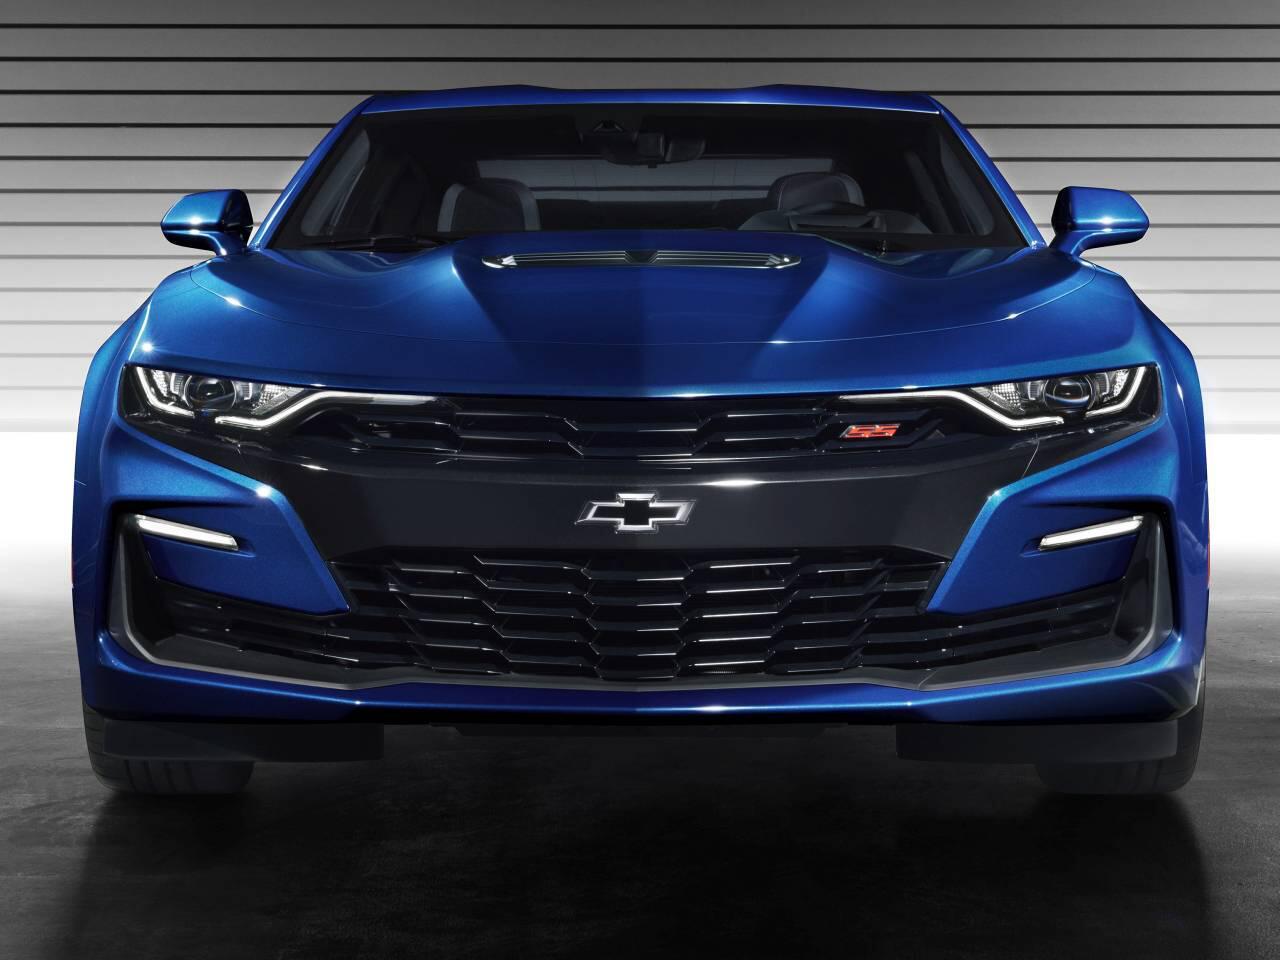 Bild zu Chevrolet Chevrolet Camaro (2019)